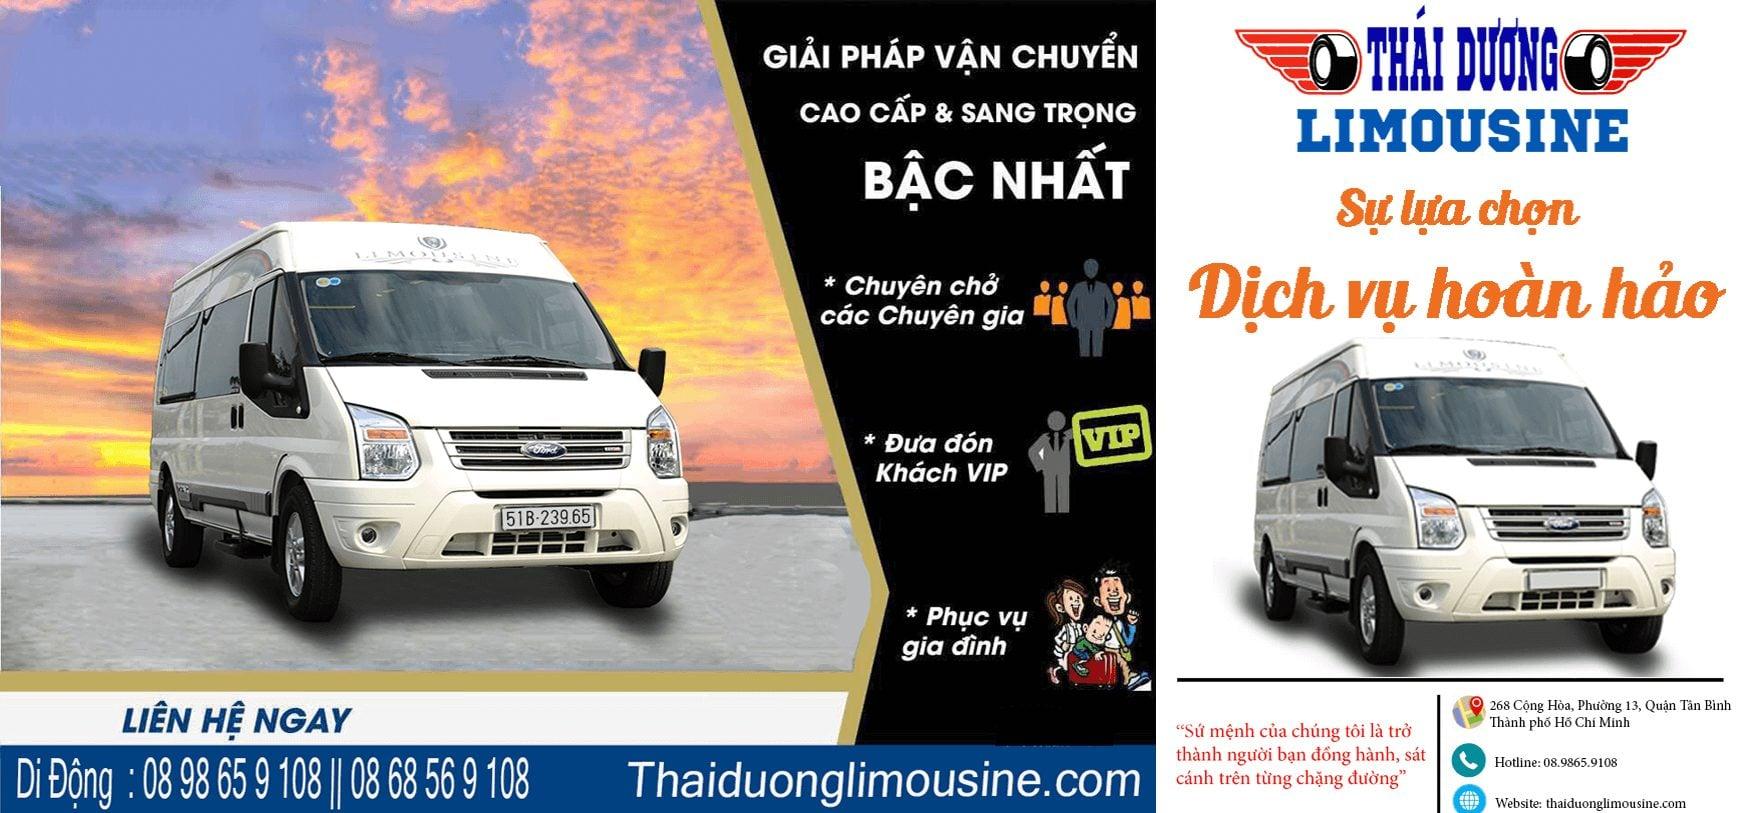 Thái Dương Limousine SG - DL